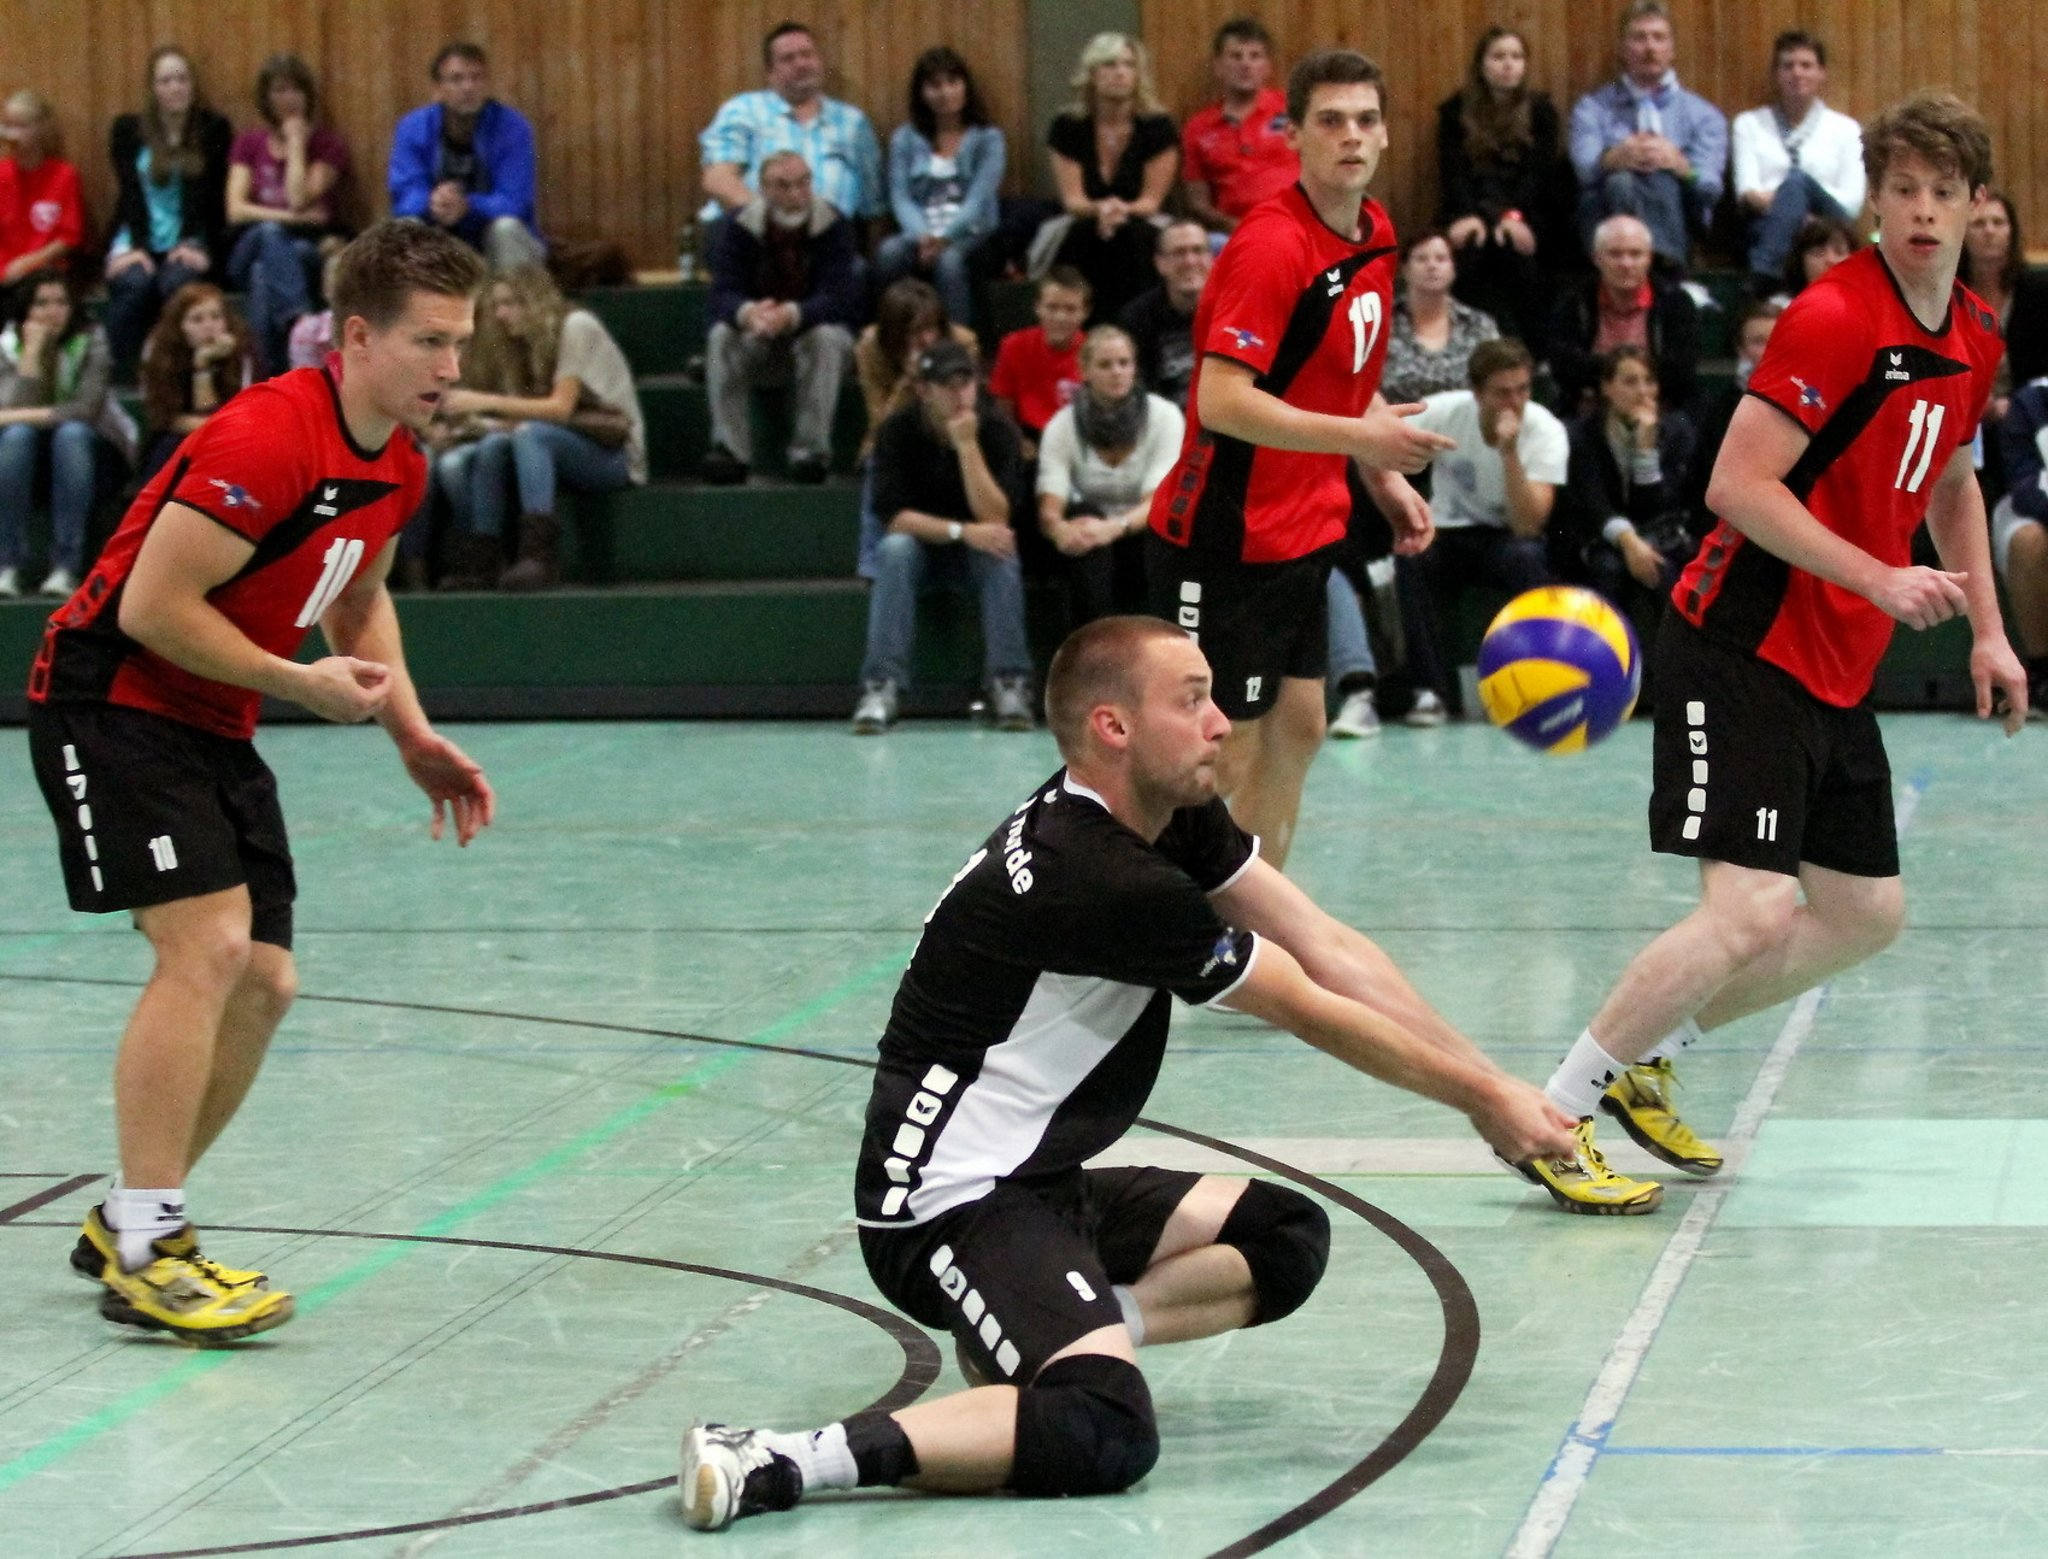 Volleyball Regionalliga Süd